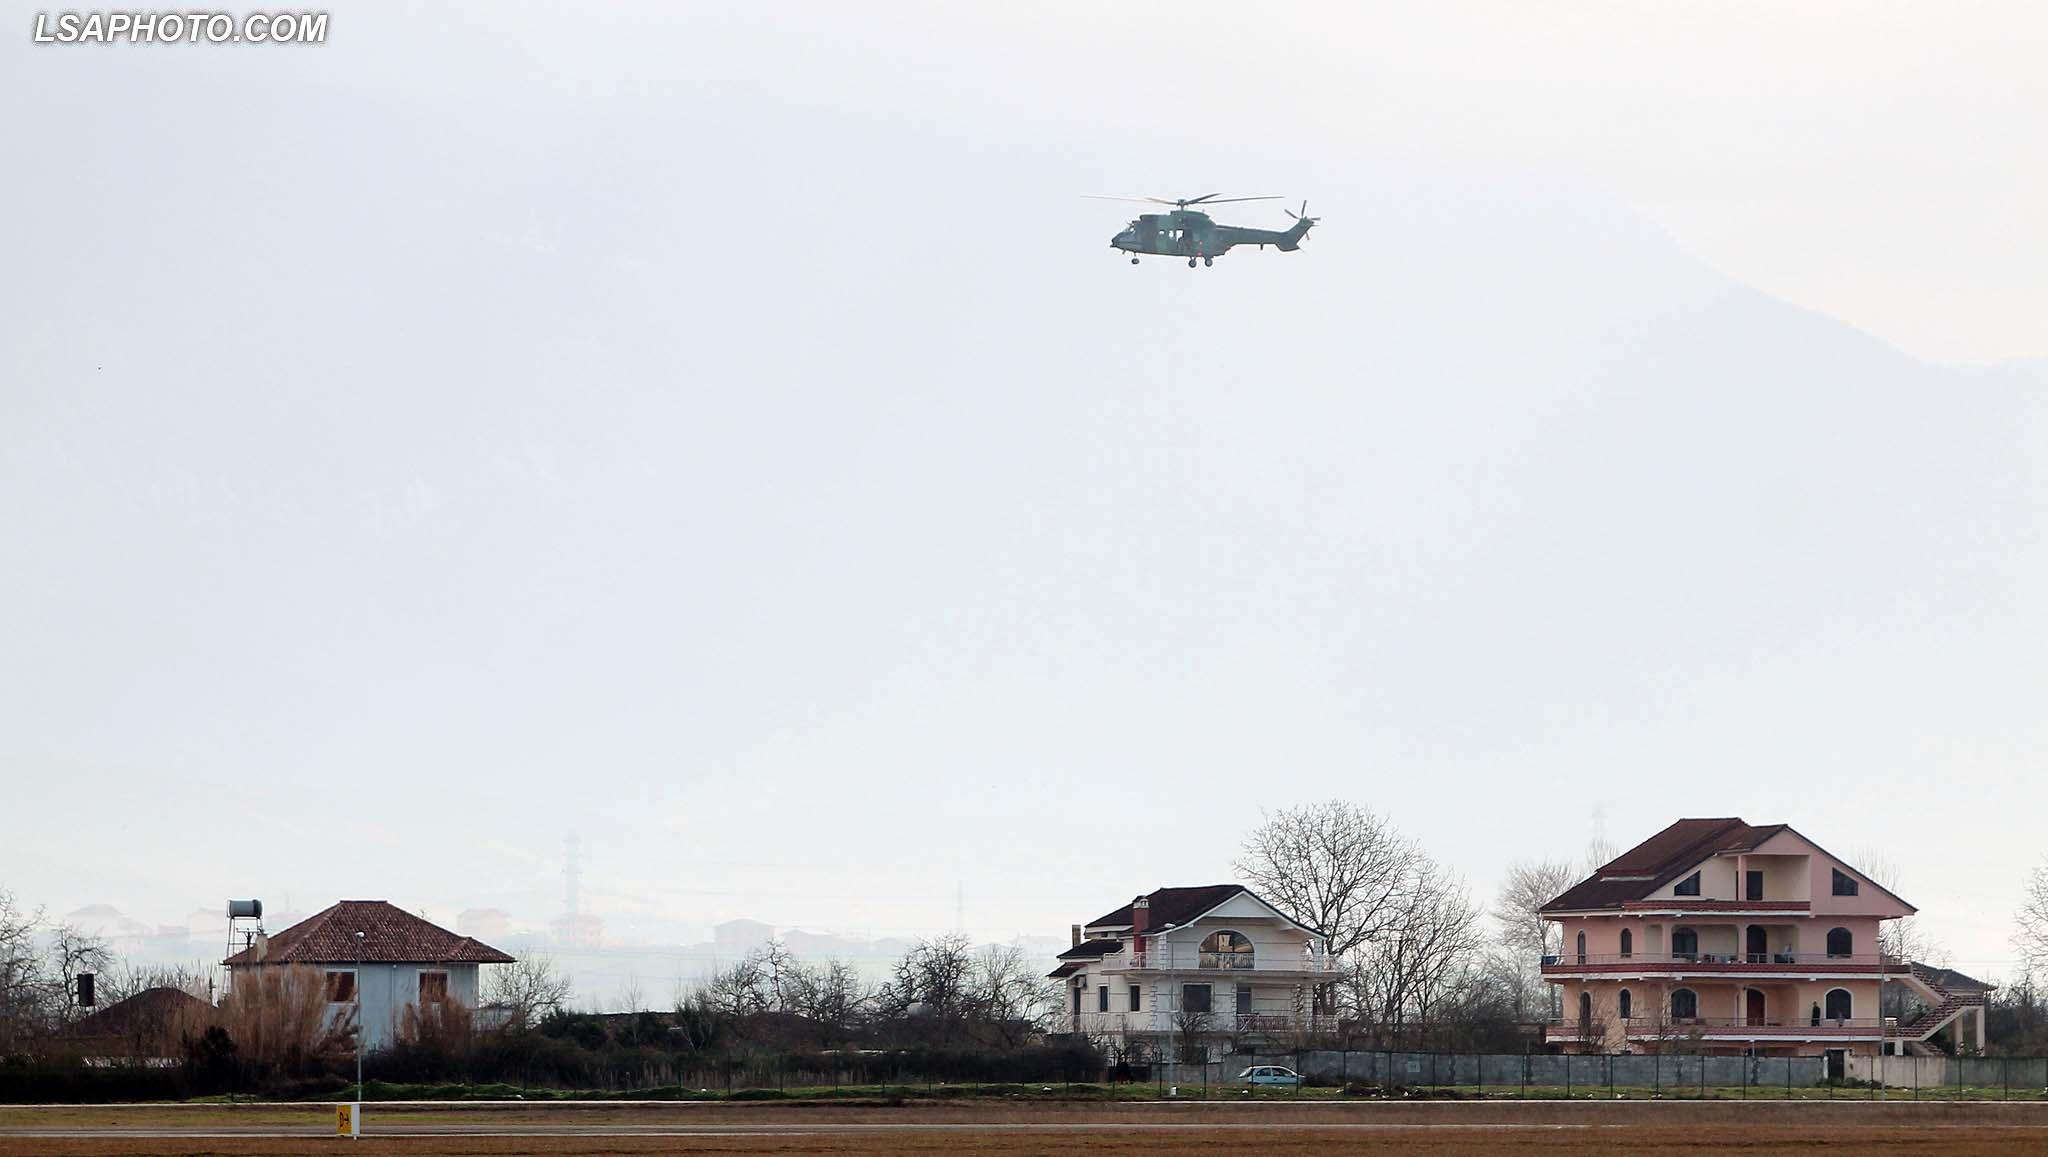 "MASAT E SIGURISE PER VIZITEN E KERRY - Nje helikopter i ushtrise, duke patrulluar mbi aeroportin ""Nene Tereza"", gjate vizites se Sekretarit Amerikan te Shtetit, John Kerry, i cili ndodhet per nje vizite zyrtare ne Tirane. /r/n/r/nSAFETY MEASURES FOR KERRY - An army helicopter, patrolling the airport ""Mother Teresa"", during the visit of US Secretary of State, John Kerry. US Secretary of State is in a few hours visit to Tirana, to meet with senior government leaders to discuss Albania's further Euro-Atlantic integration and strong bilateral cooperation with the United States."